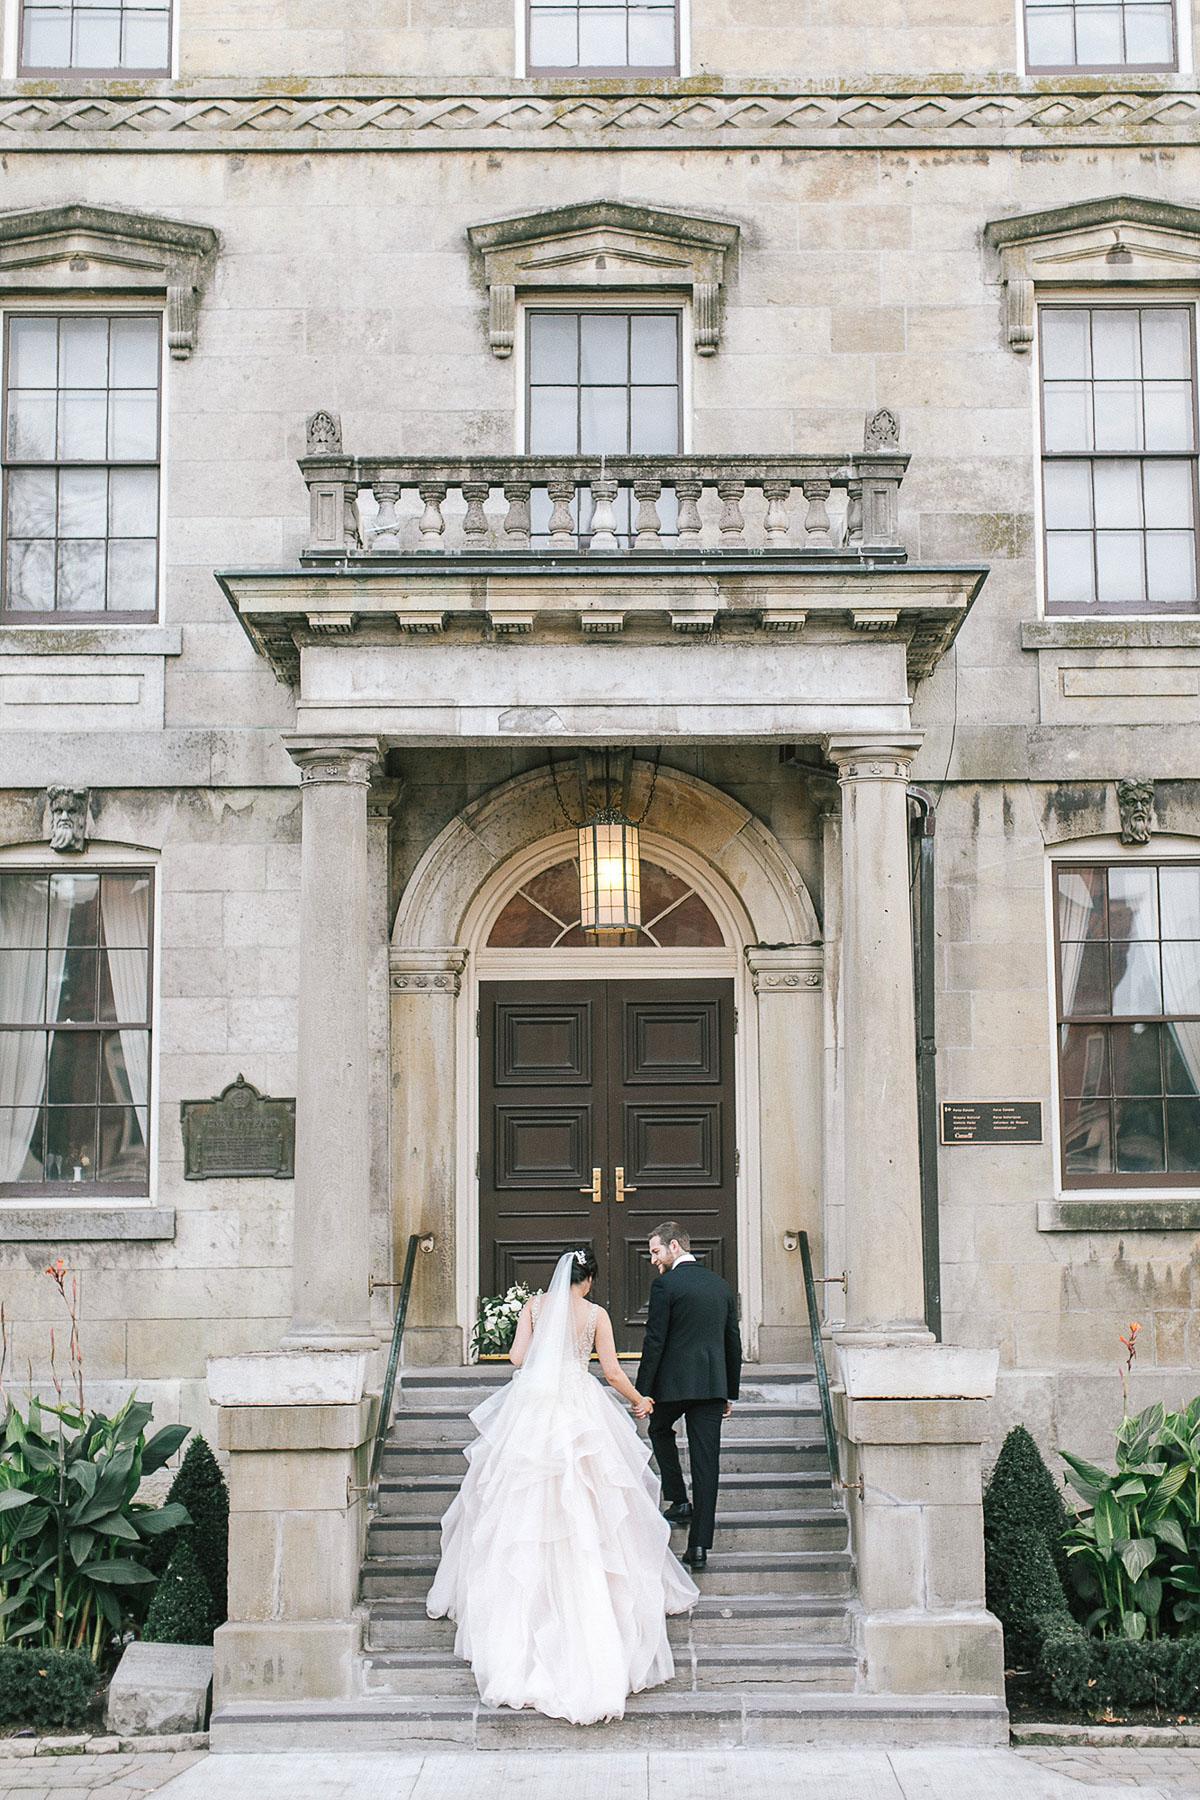 tamara-lockwood-photography-vineyard-bride-swish-list-the-old-courthouse-niagara-on-the-lake-wedding-43.jpg